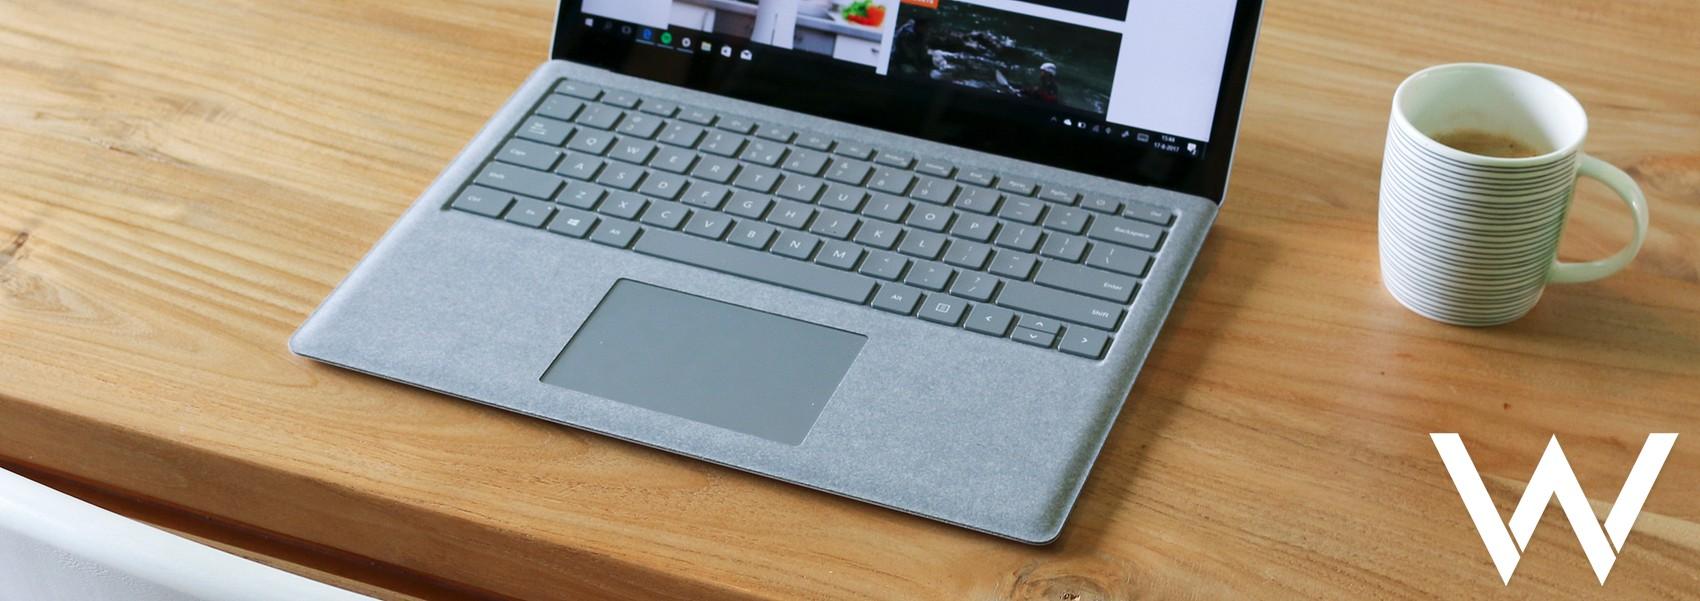 gebruik muis laptop